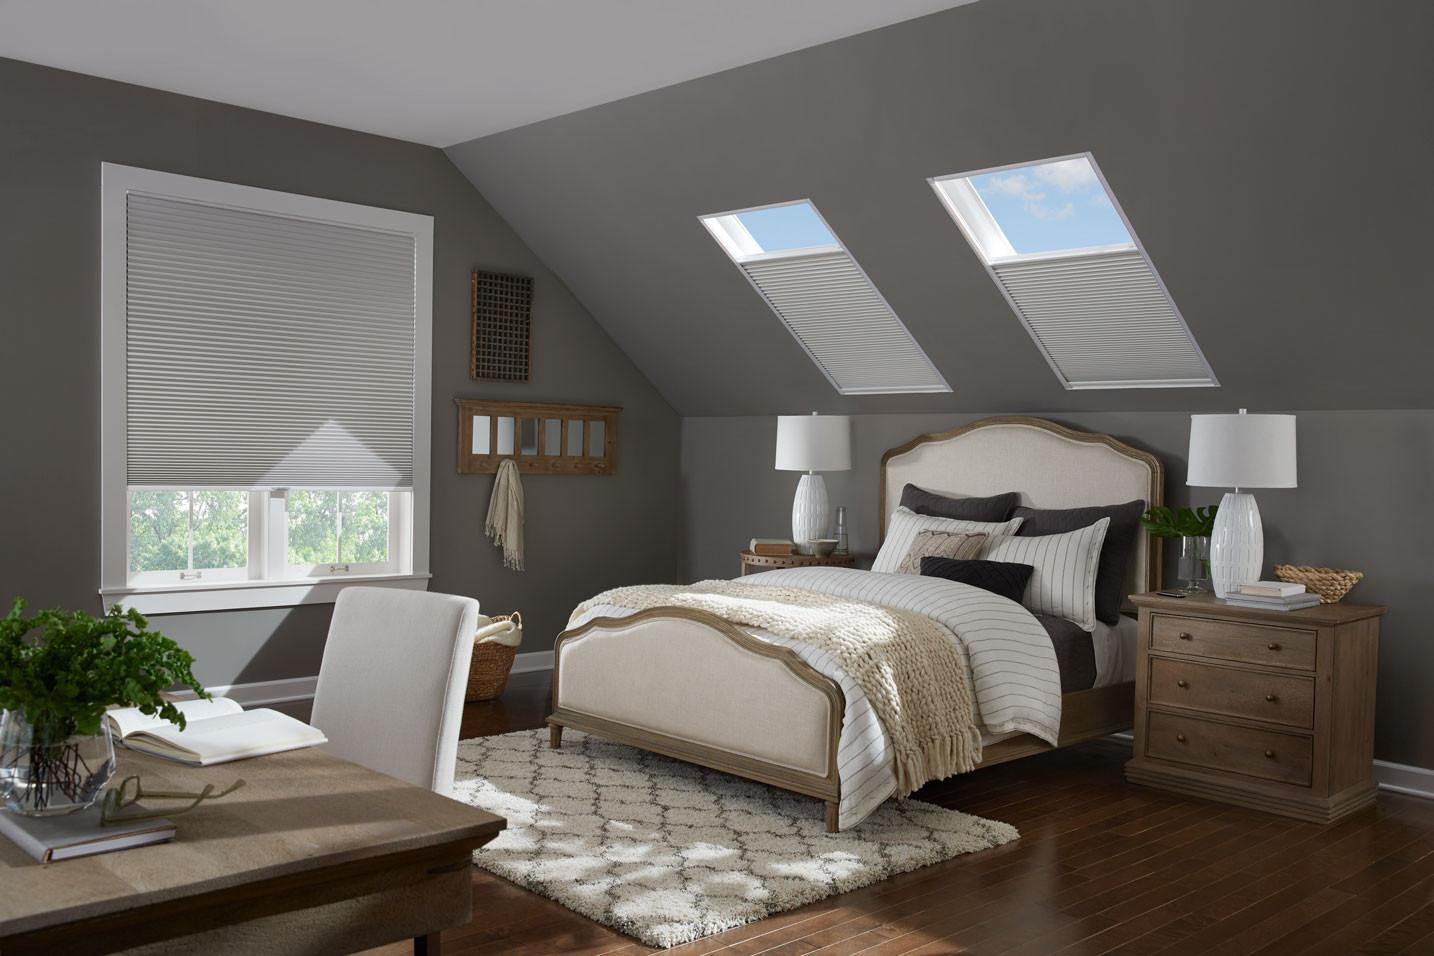 honeycomb shades bedroom